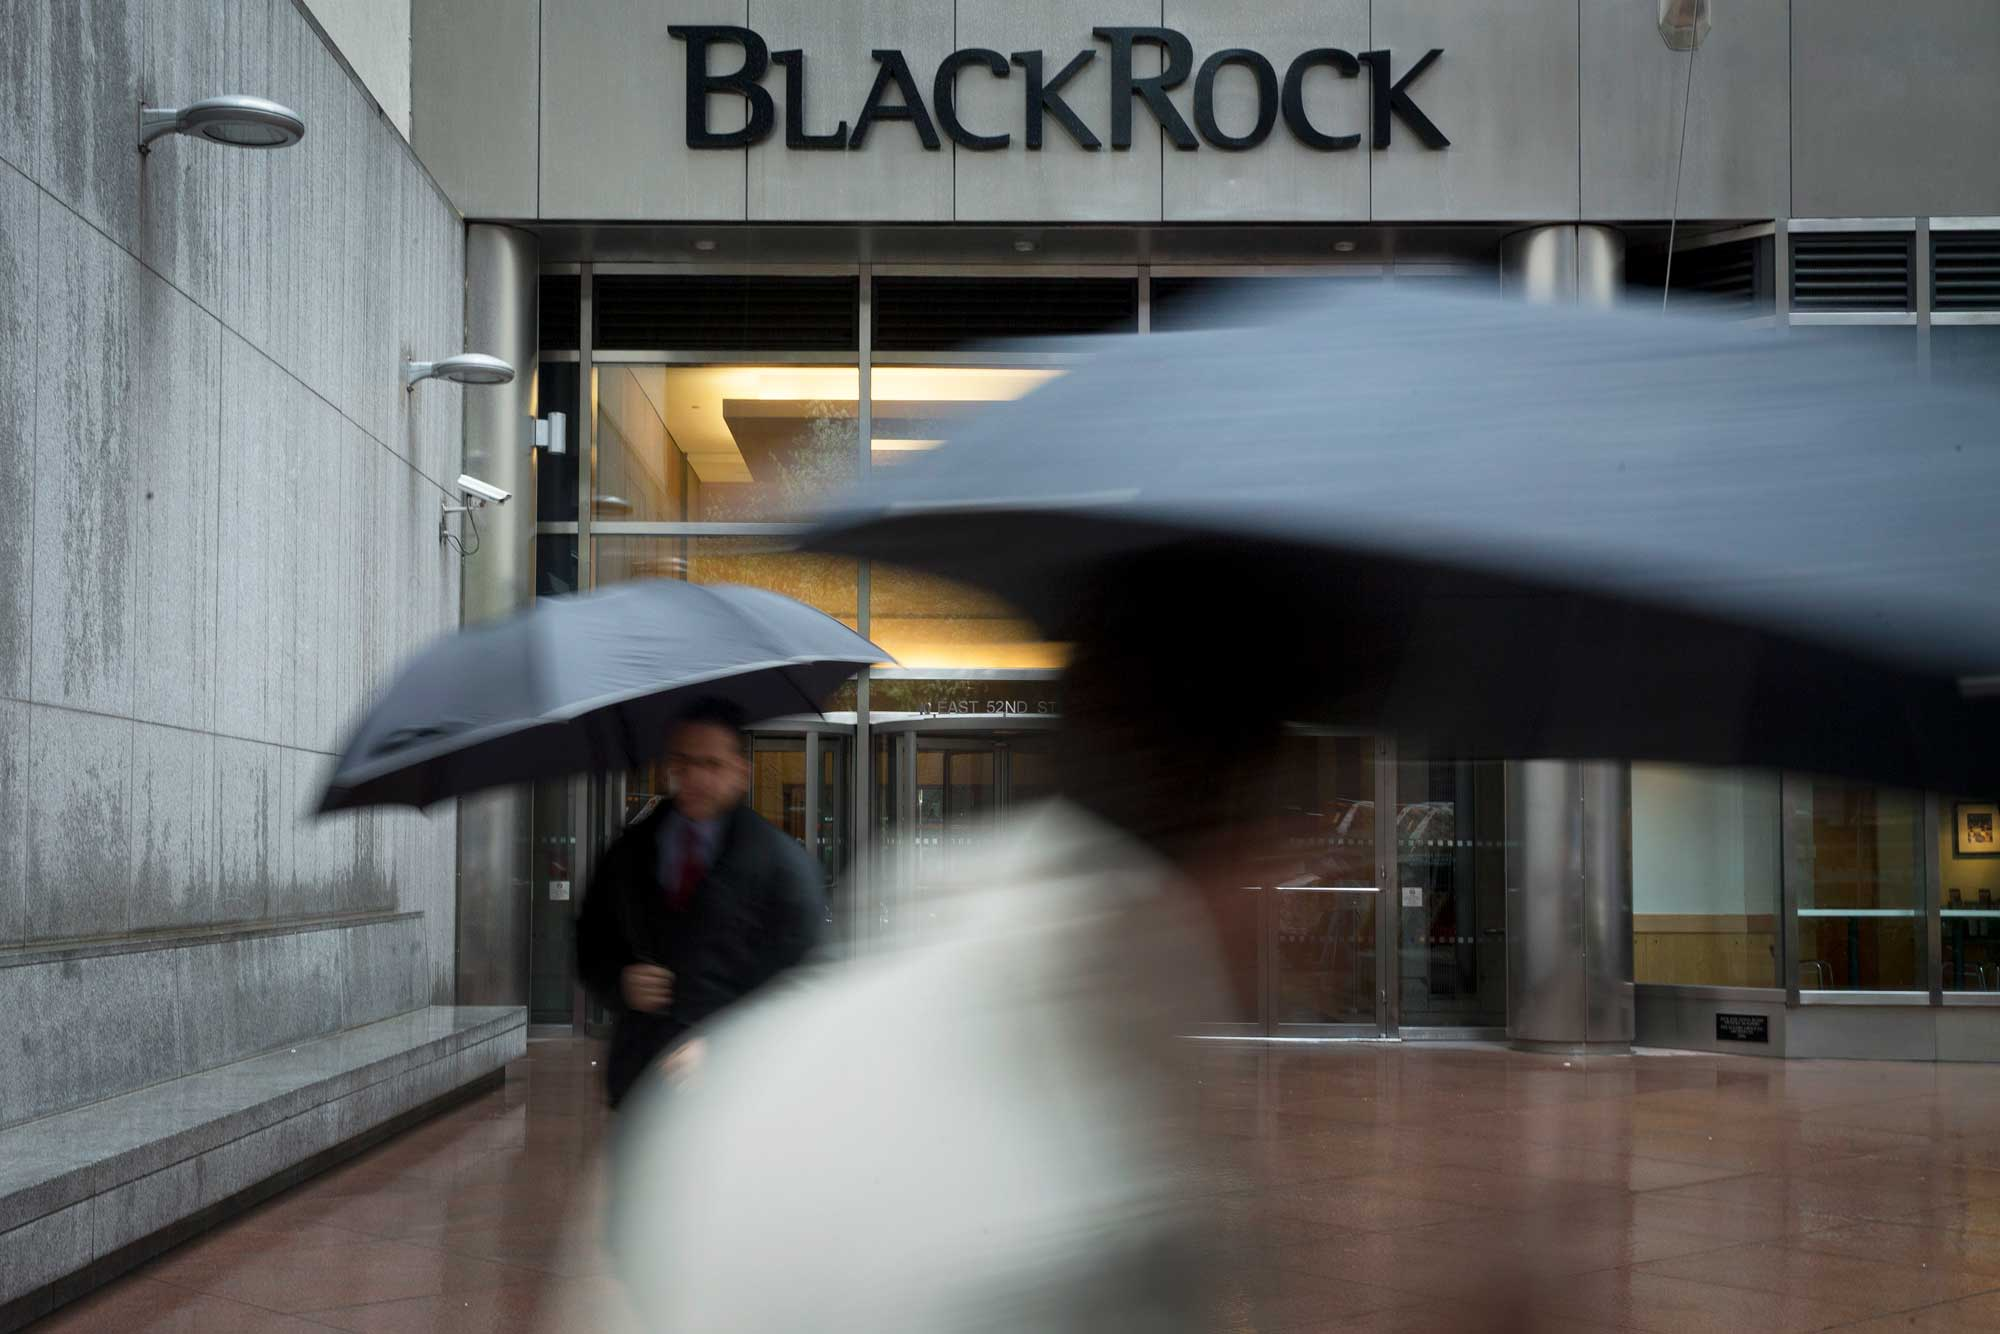 Stocks making the biggest moves premarket: Johnson & Johnson, Blackroc... image